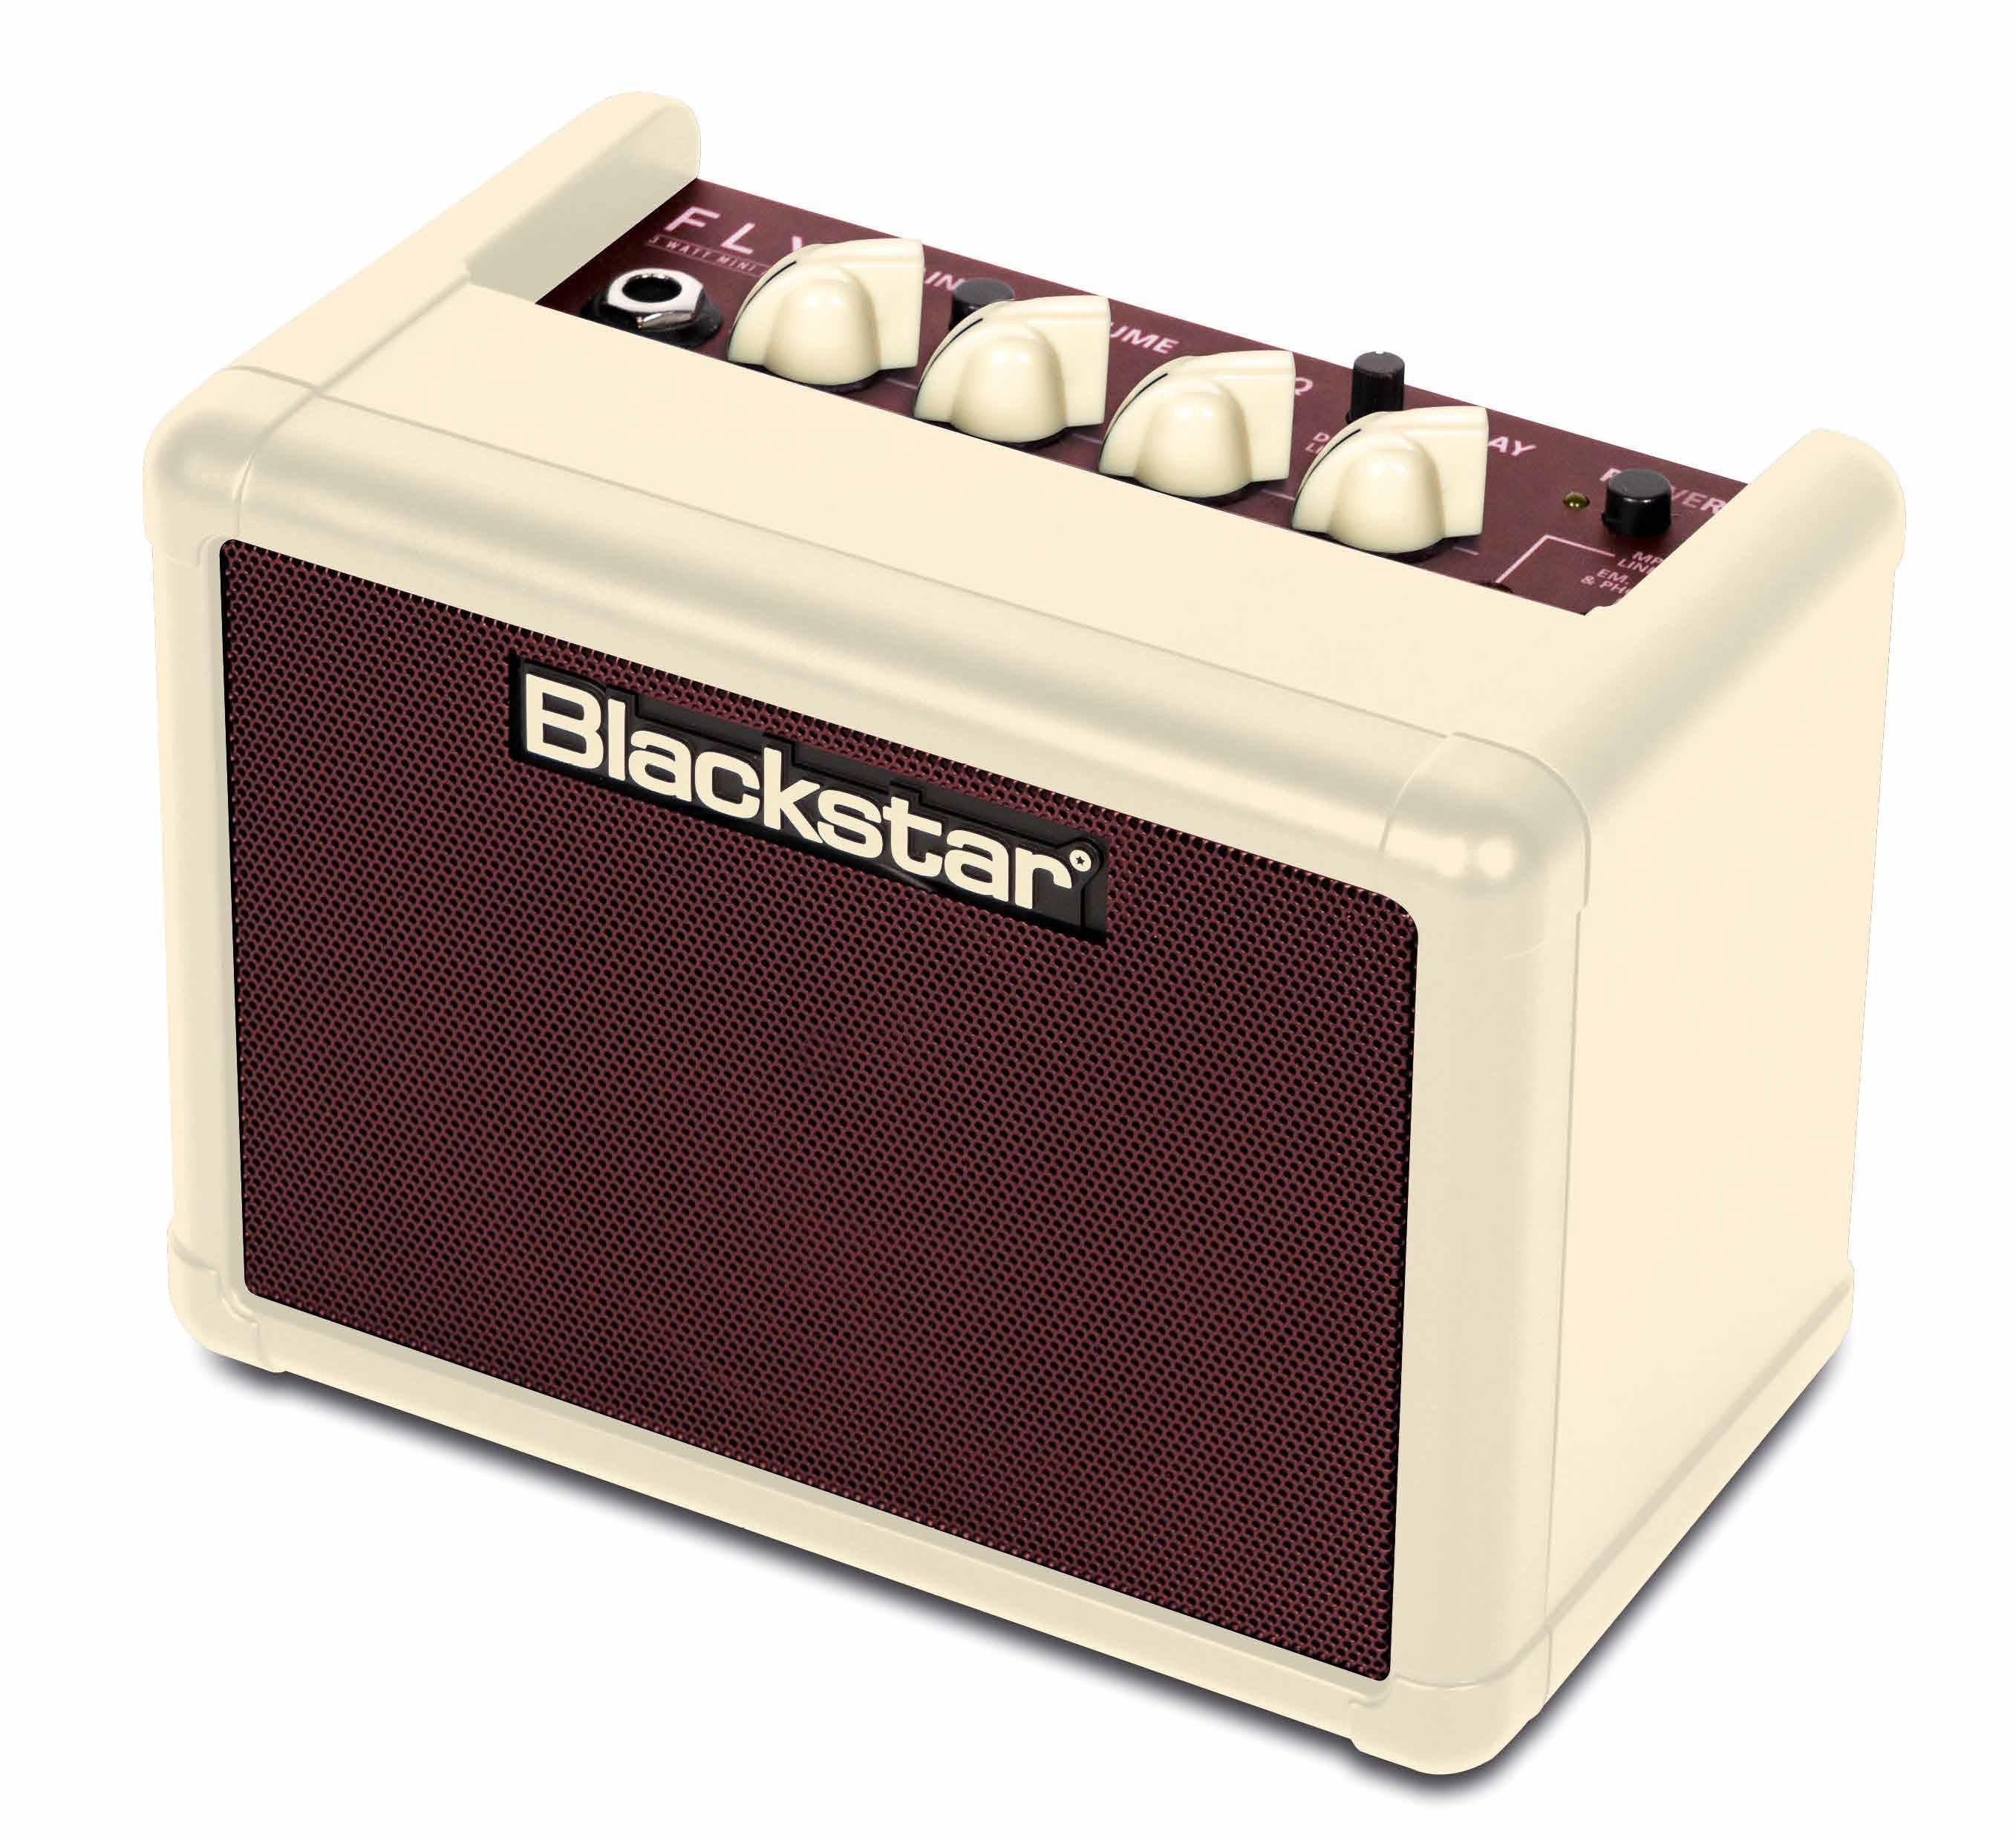 Blackstar Fly 3 Mini Amp Vintage Limited Edition